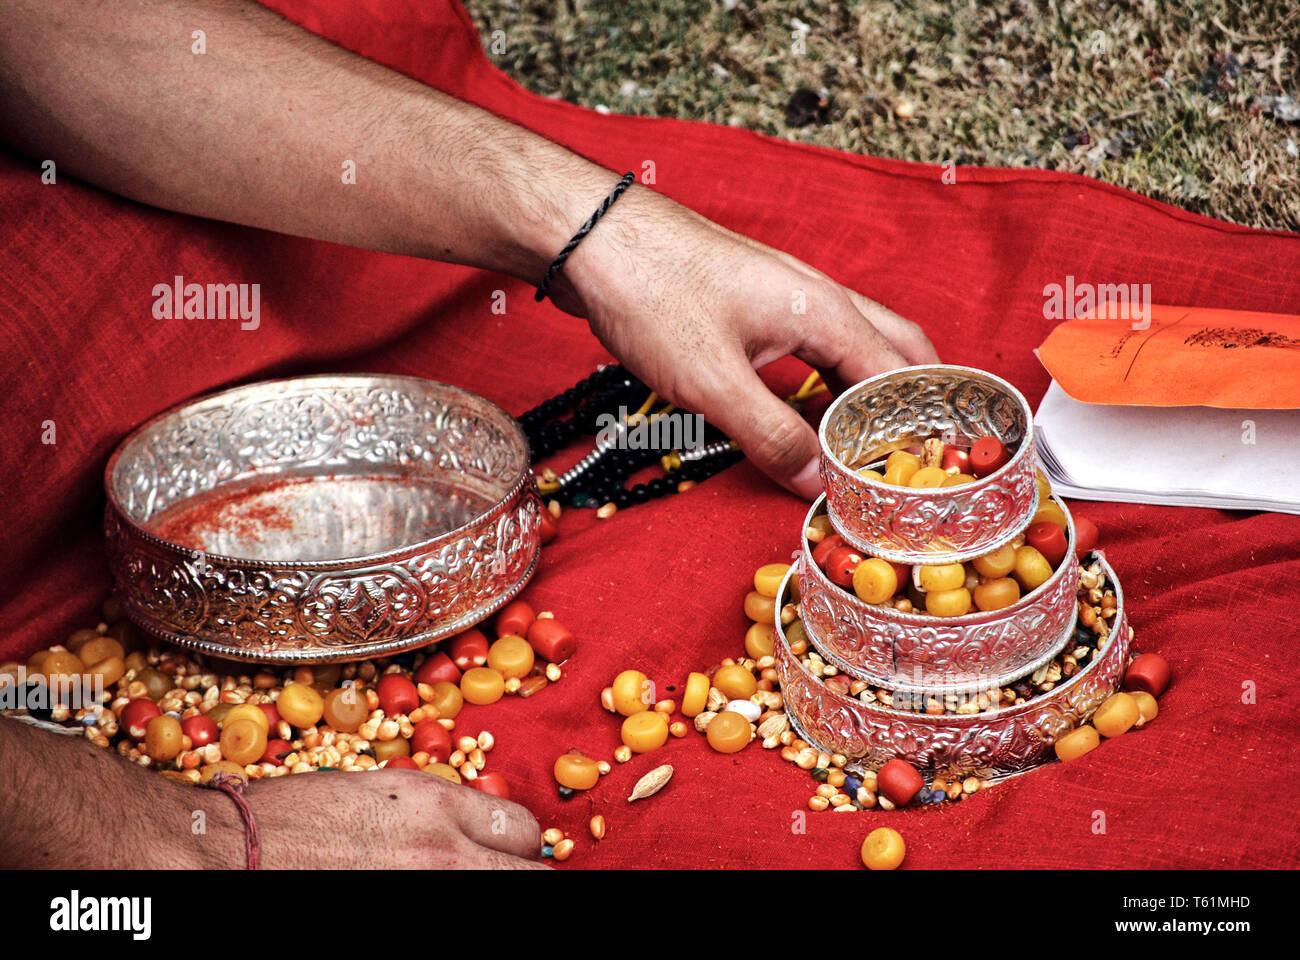 Buddhist devotional practices - Kathmandu, Nepal - Stock Image